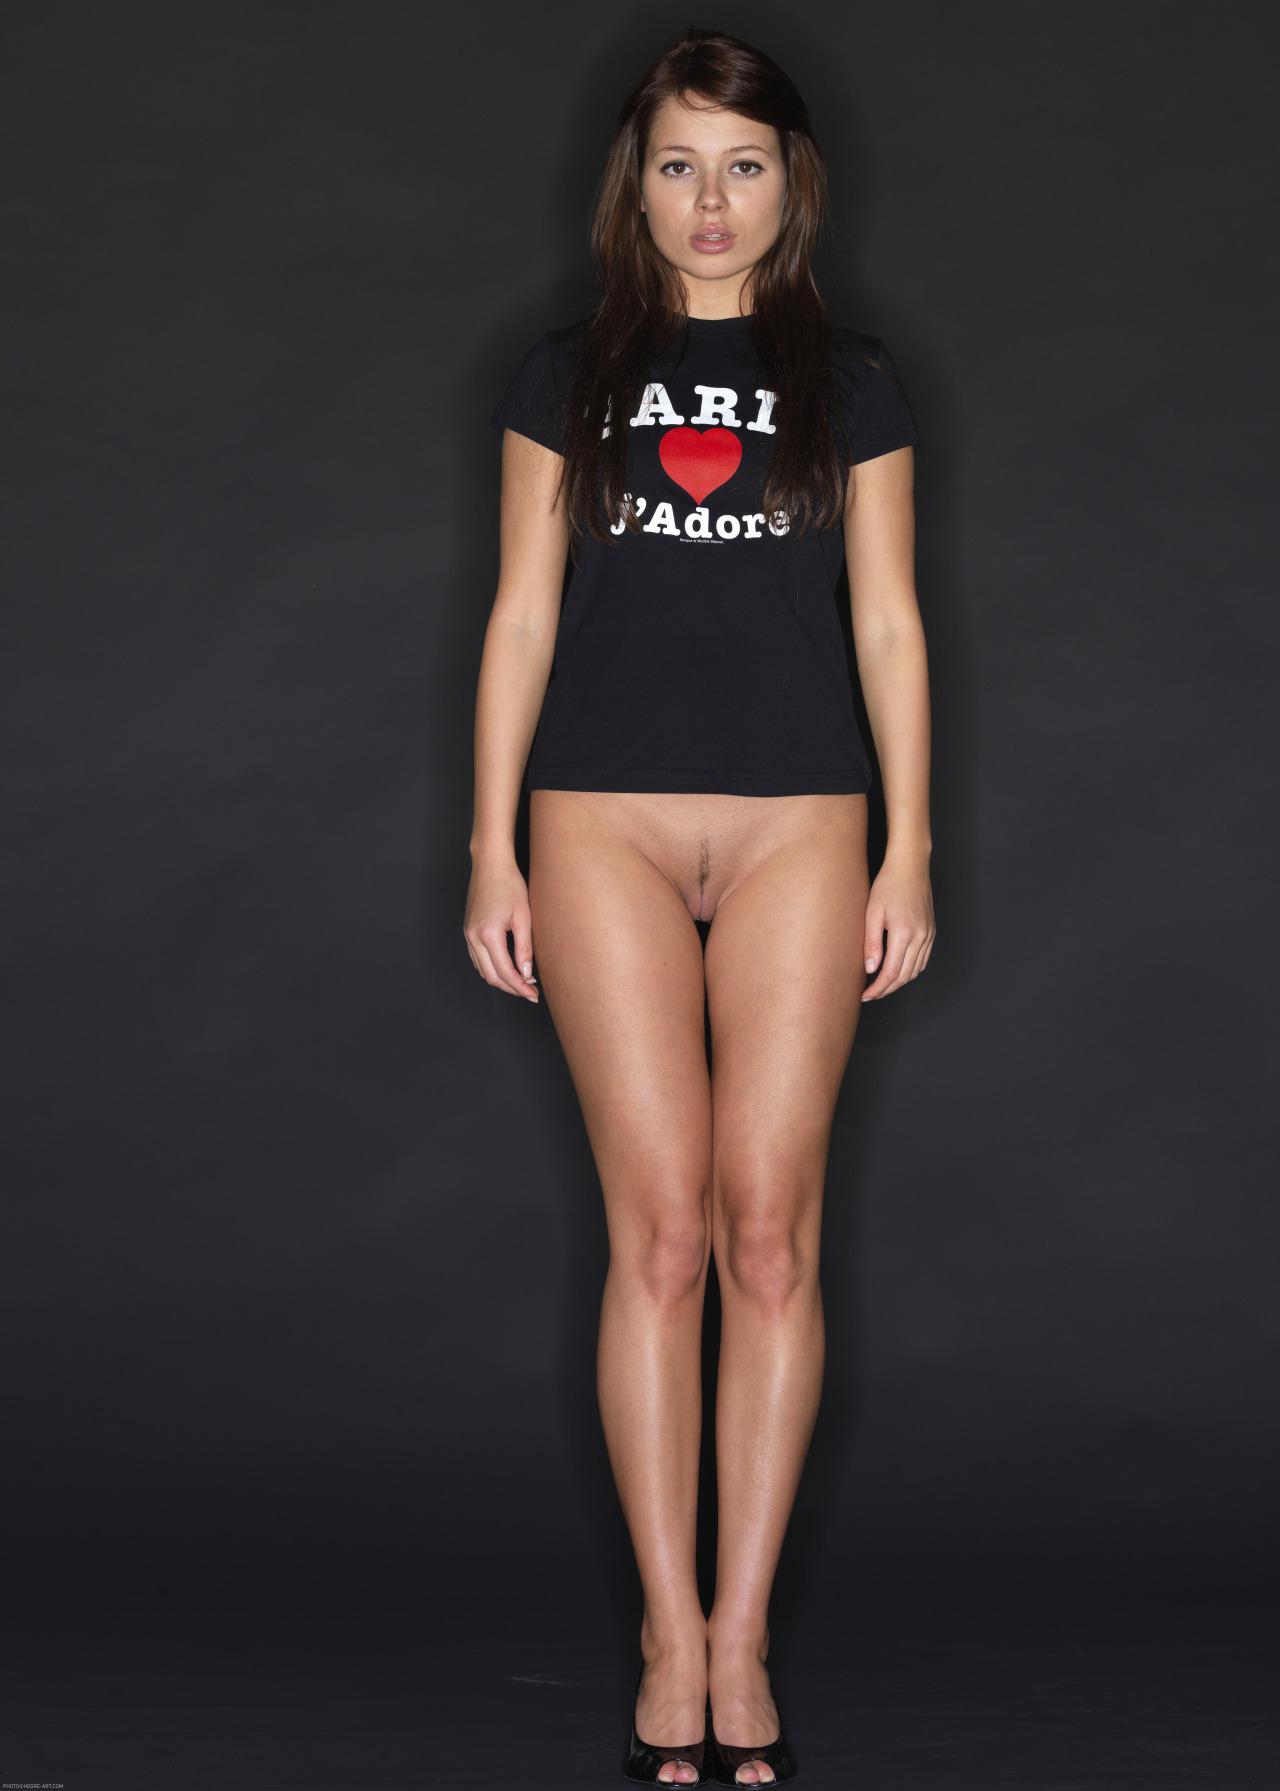 bottomless-girls-nude-mix-44